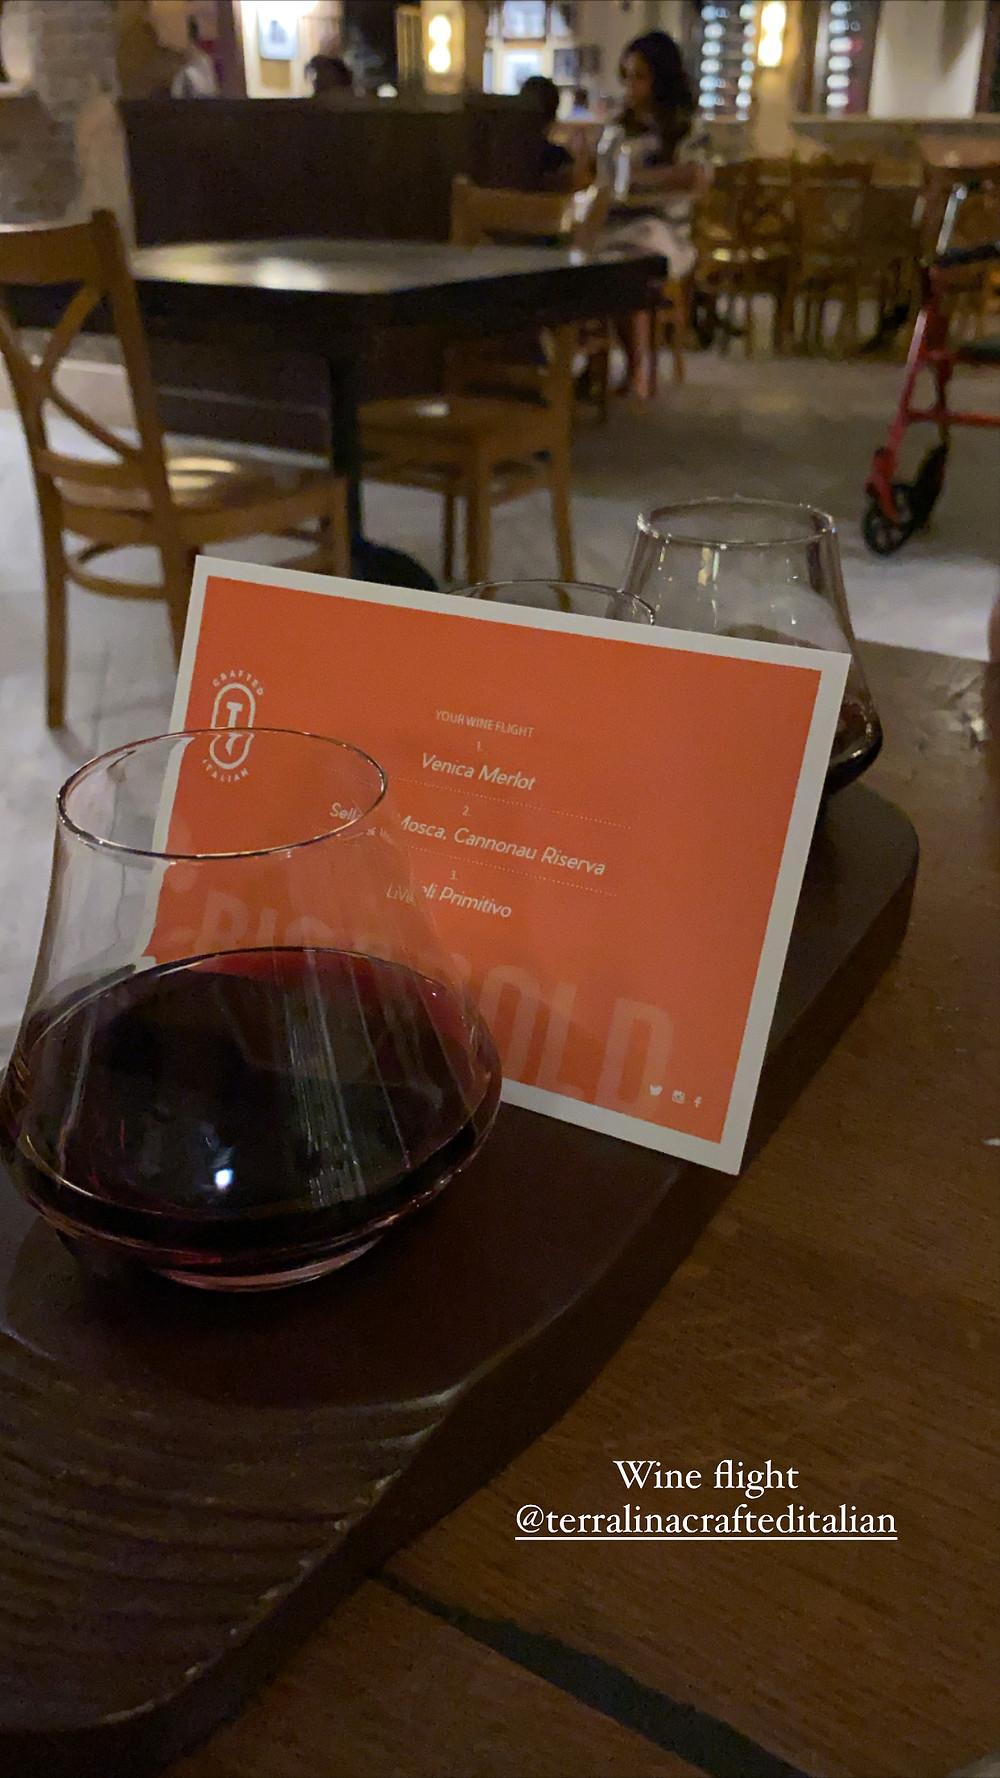 Big & bold wine flight